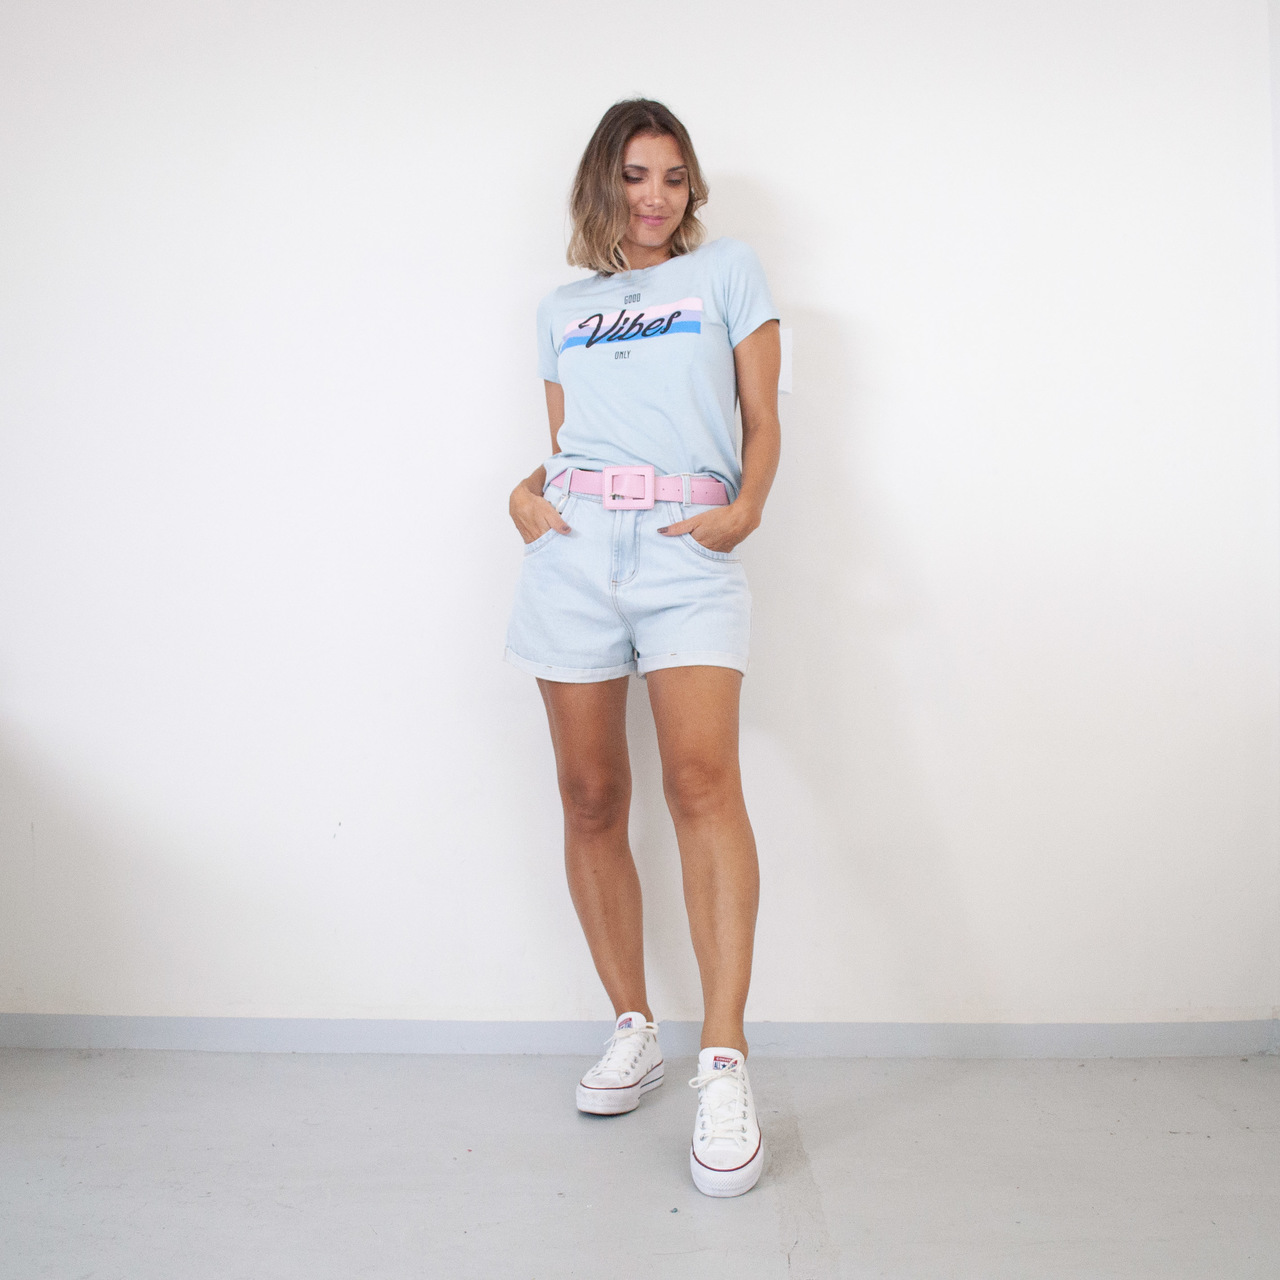 T-Shirt Viscolycra Gola U - Vibes - Azul Claro